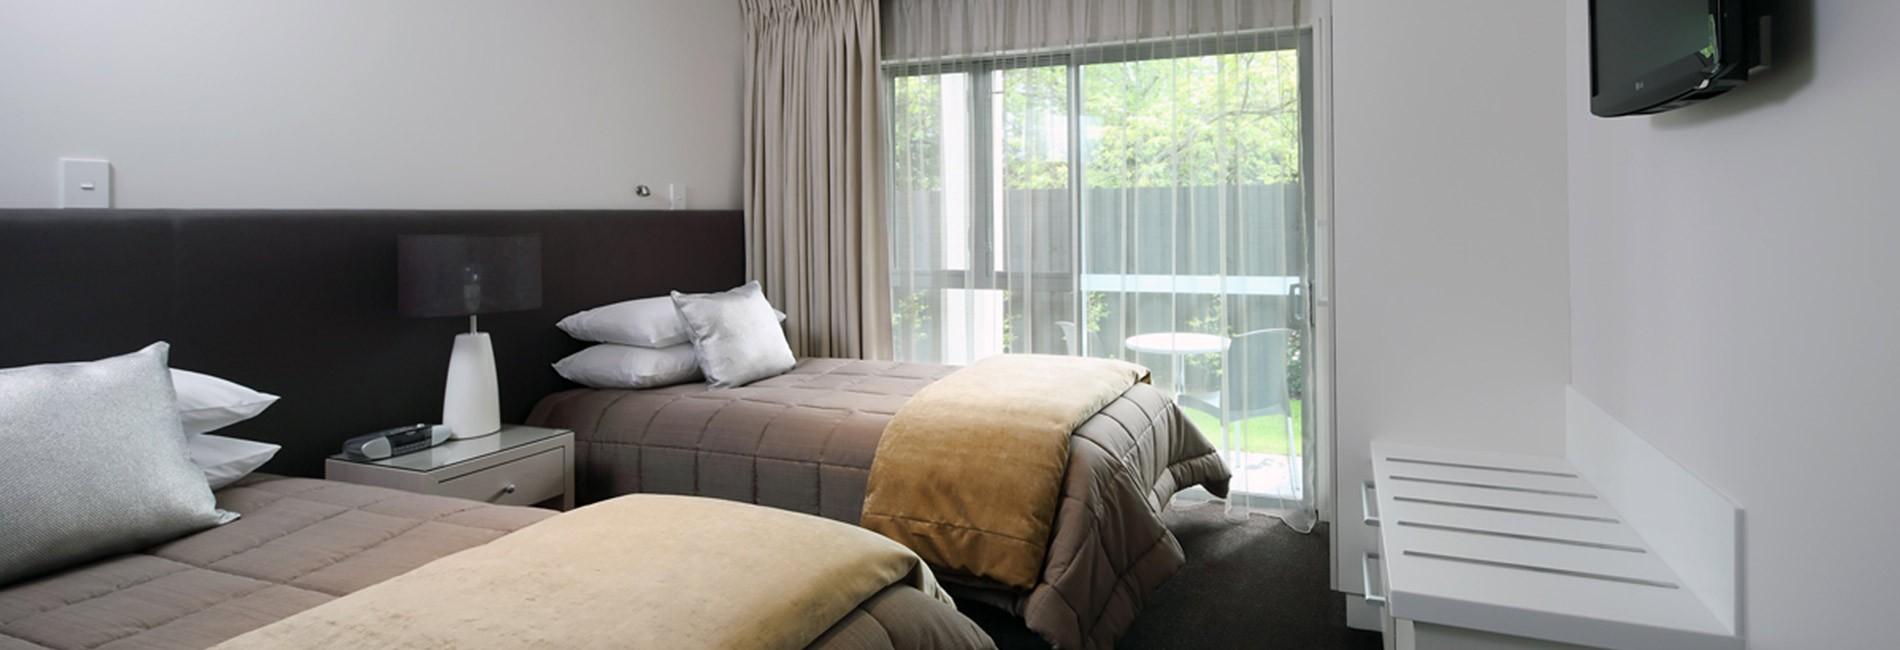 nelson accommodation